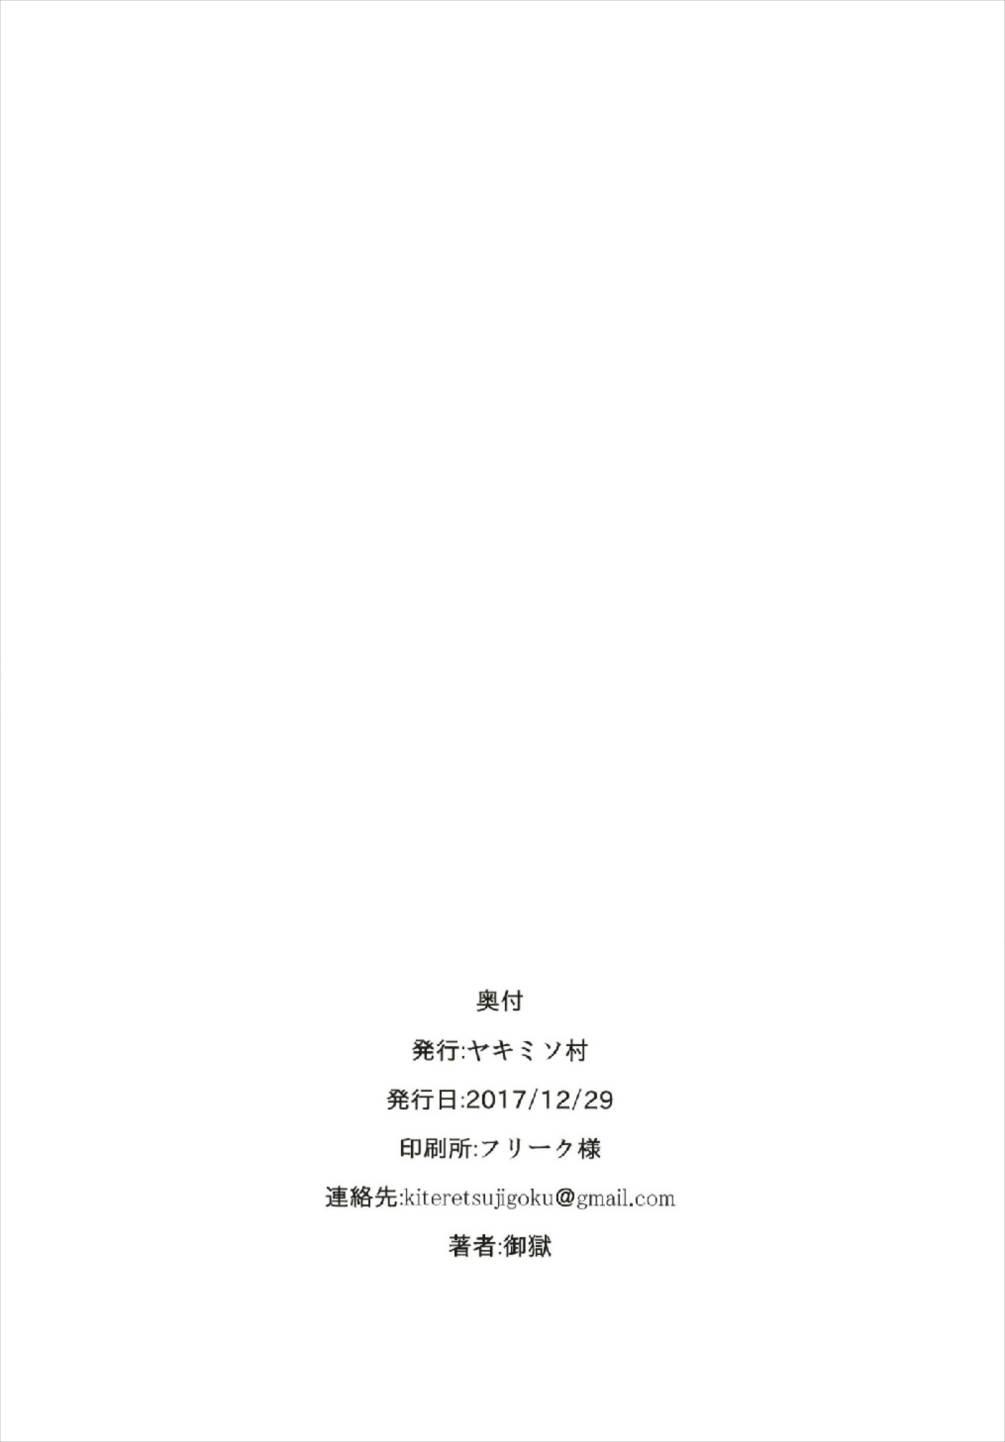 (C93) [Yakimisomura (Utaki)] Matsuwa-chan Etorofu-chan Gomennasai (Kantai Collection -KanColle-) [Chinese] [球磨提督个人汉化] 22